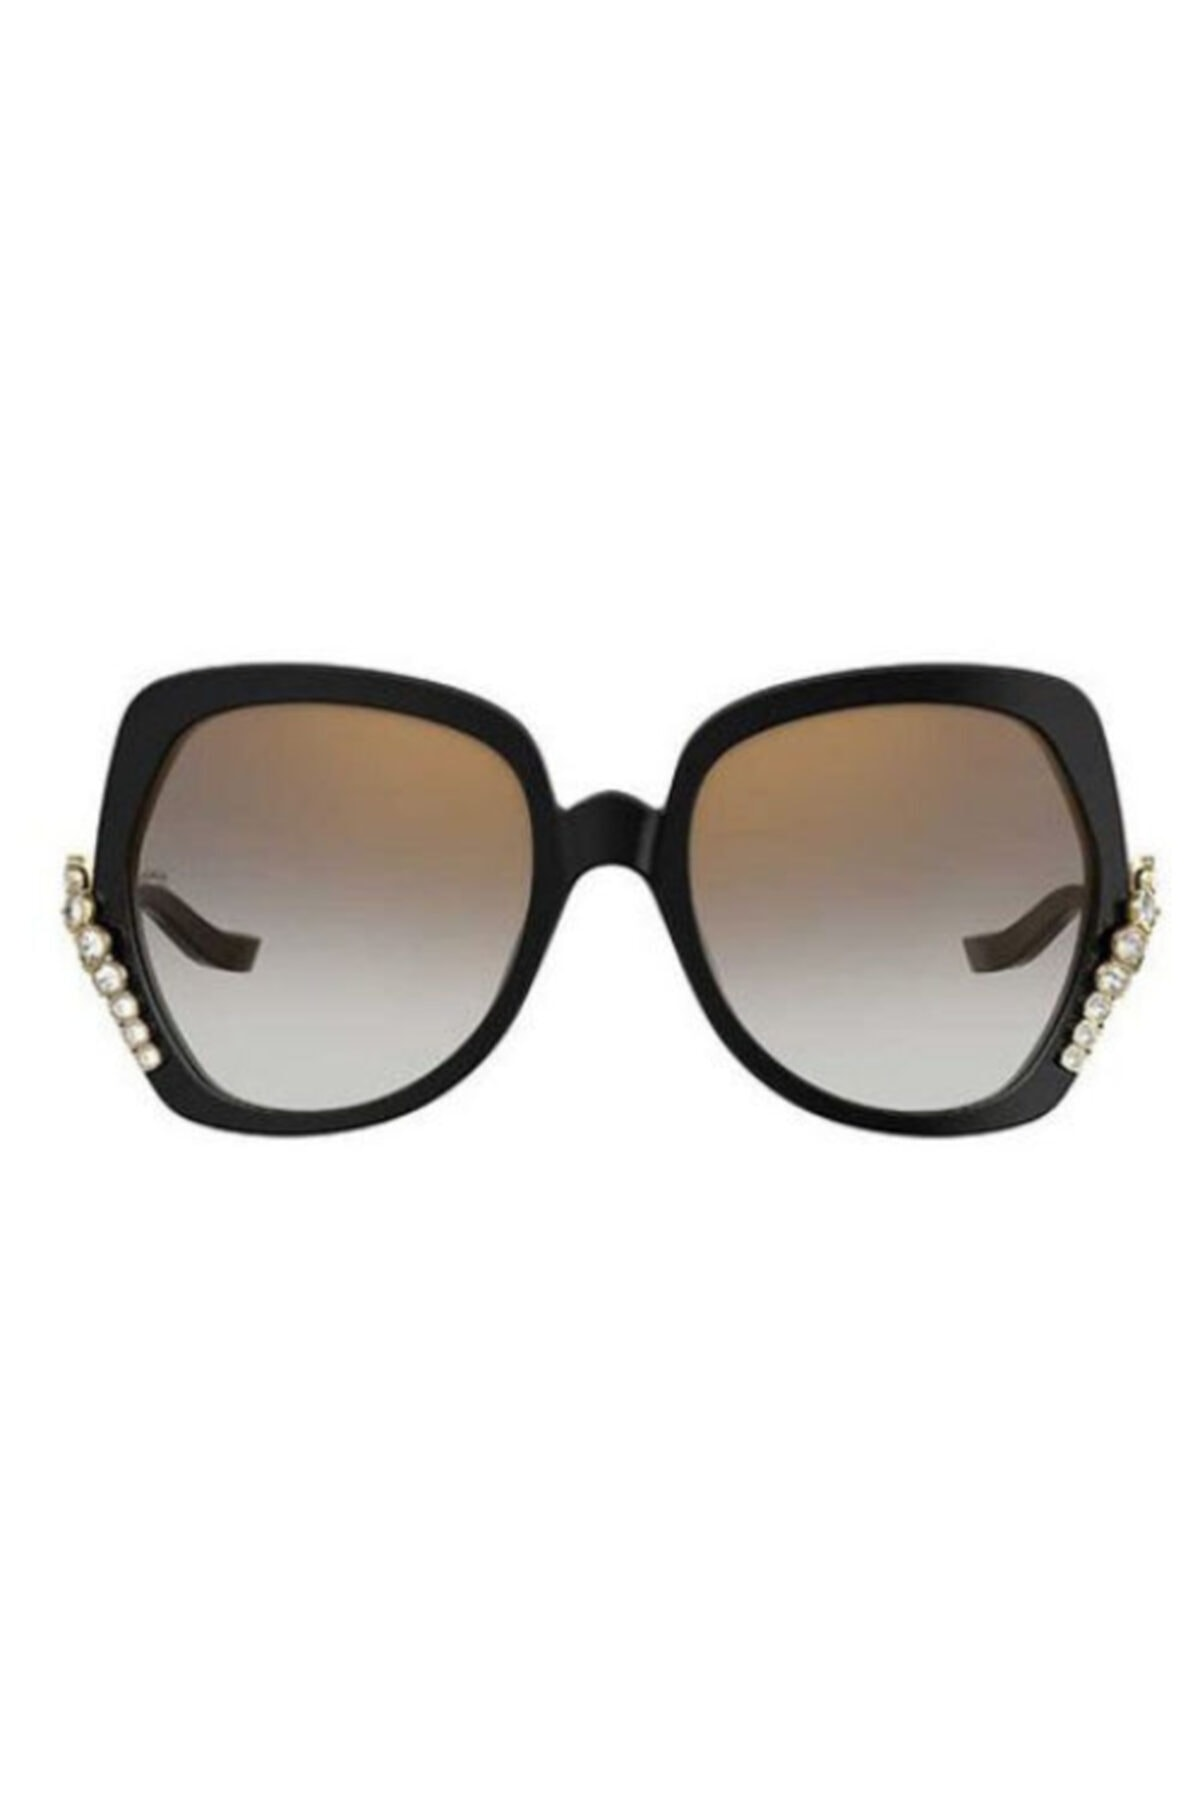 Elie Saab Kadın Güneş Gözlüğü Elıe Saab 2